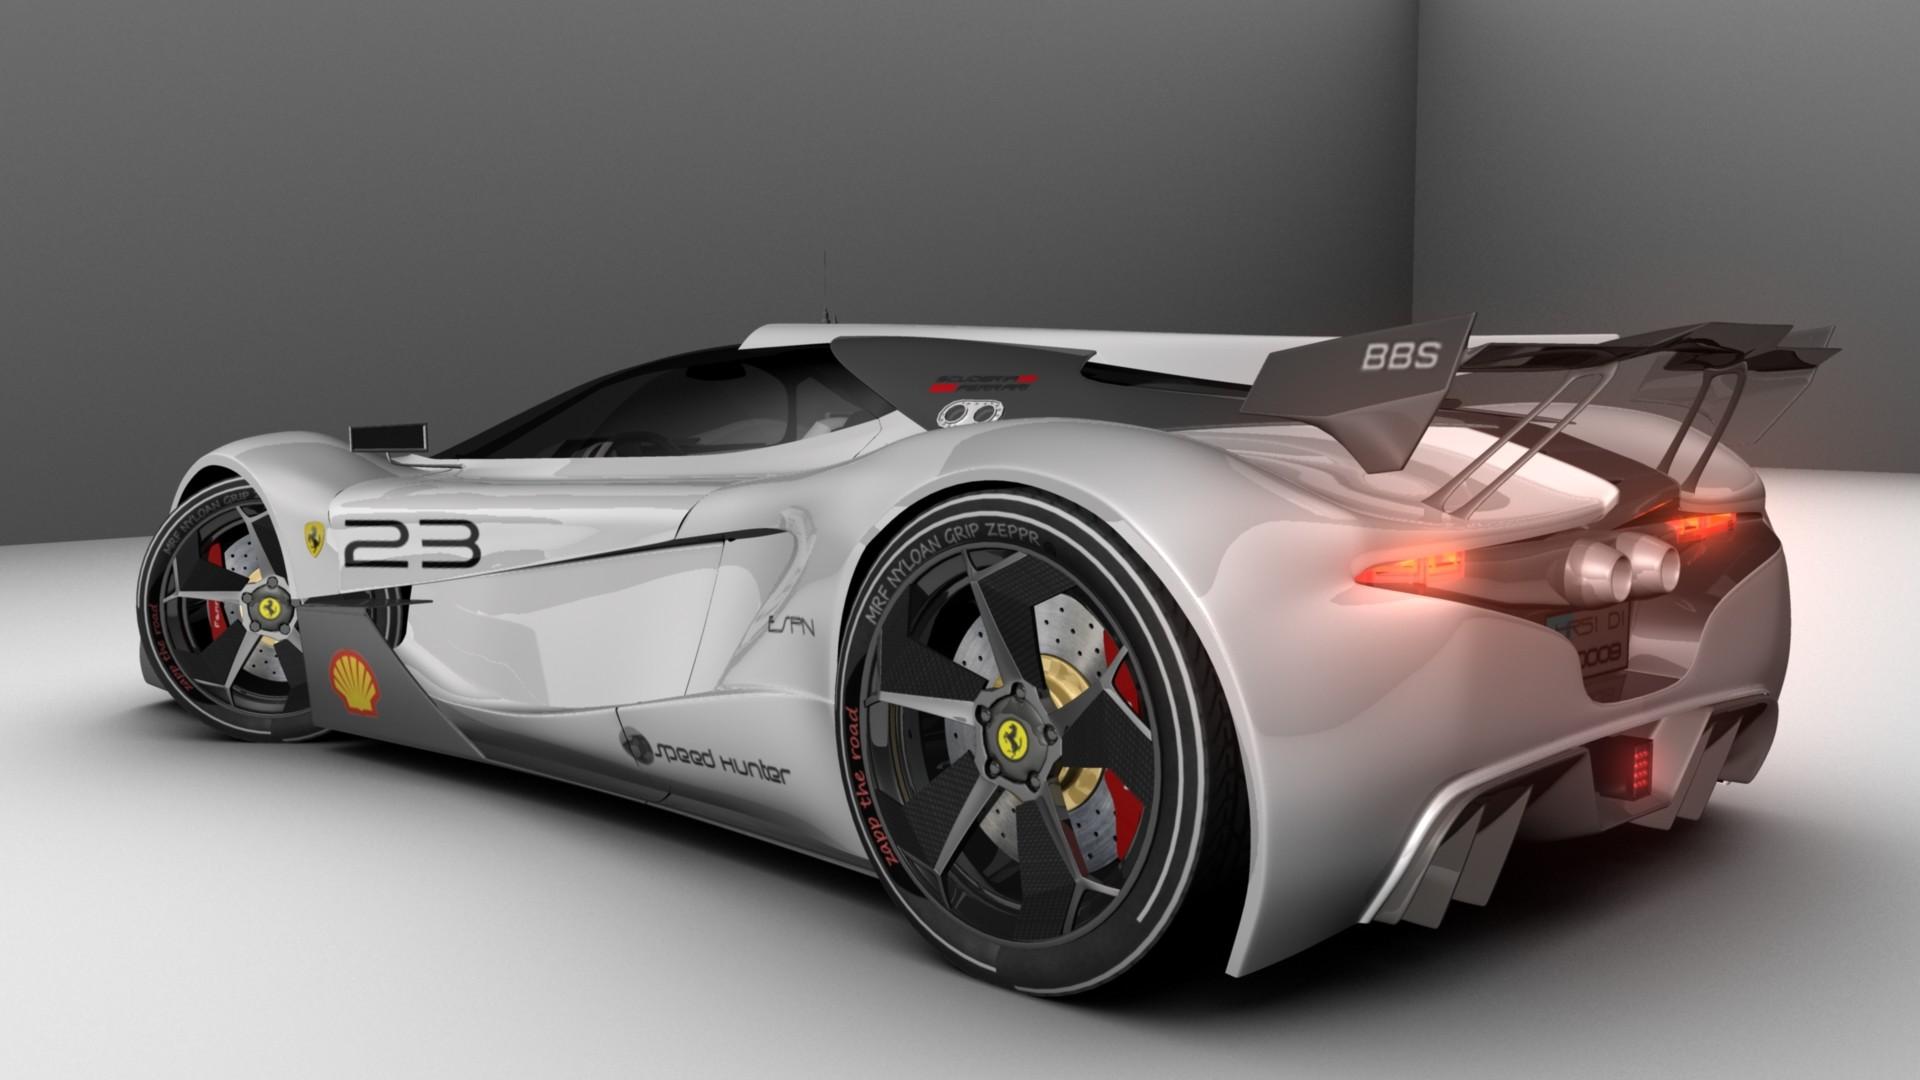 Ud Sharma Yudhisther Ferrari Concept Cars